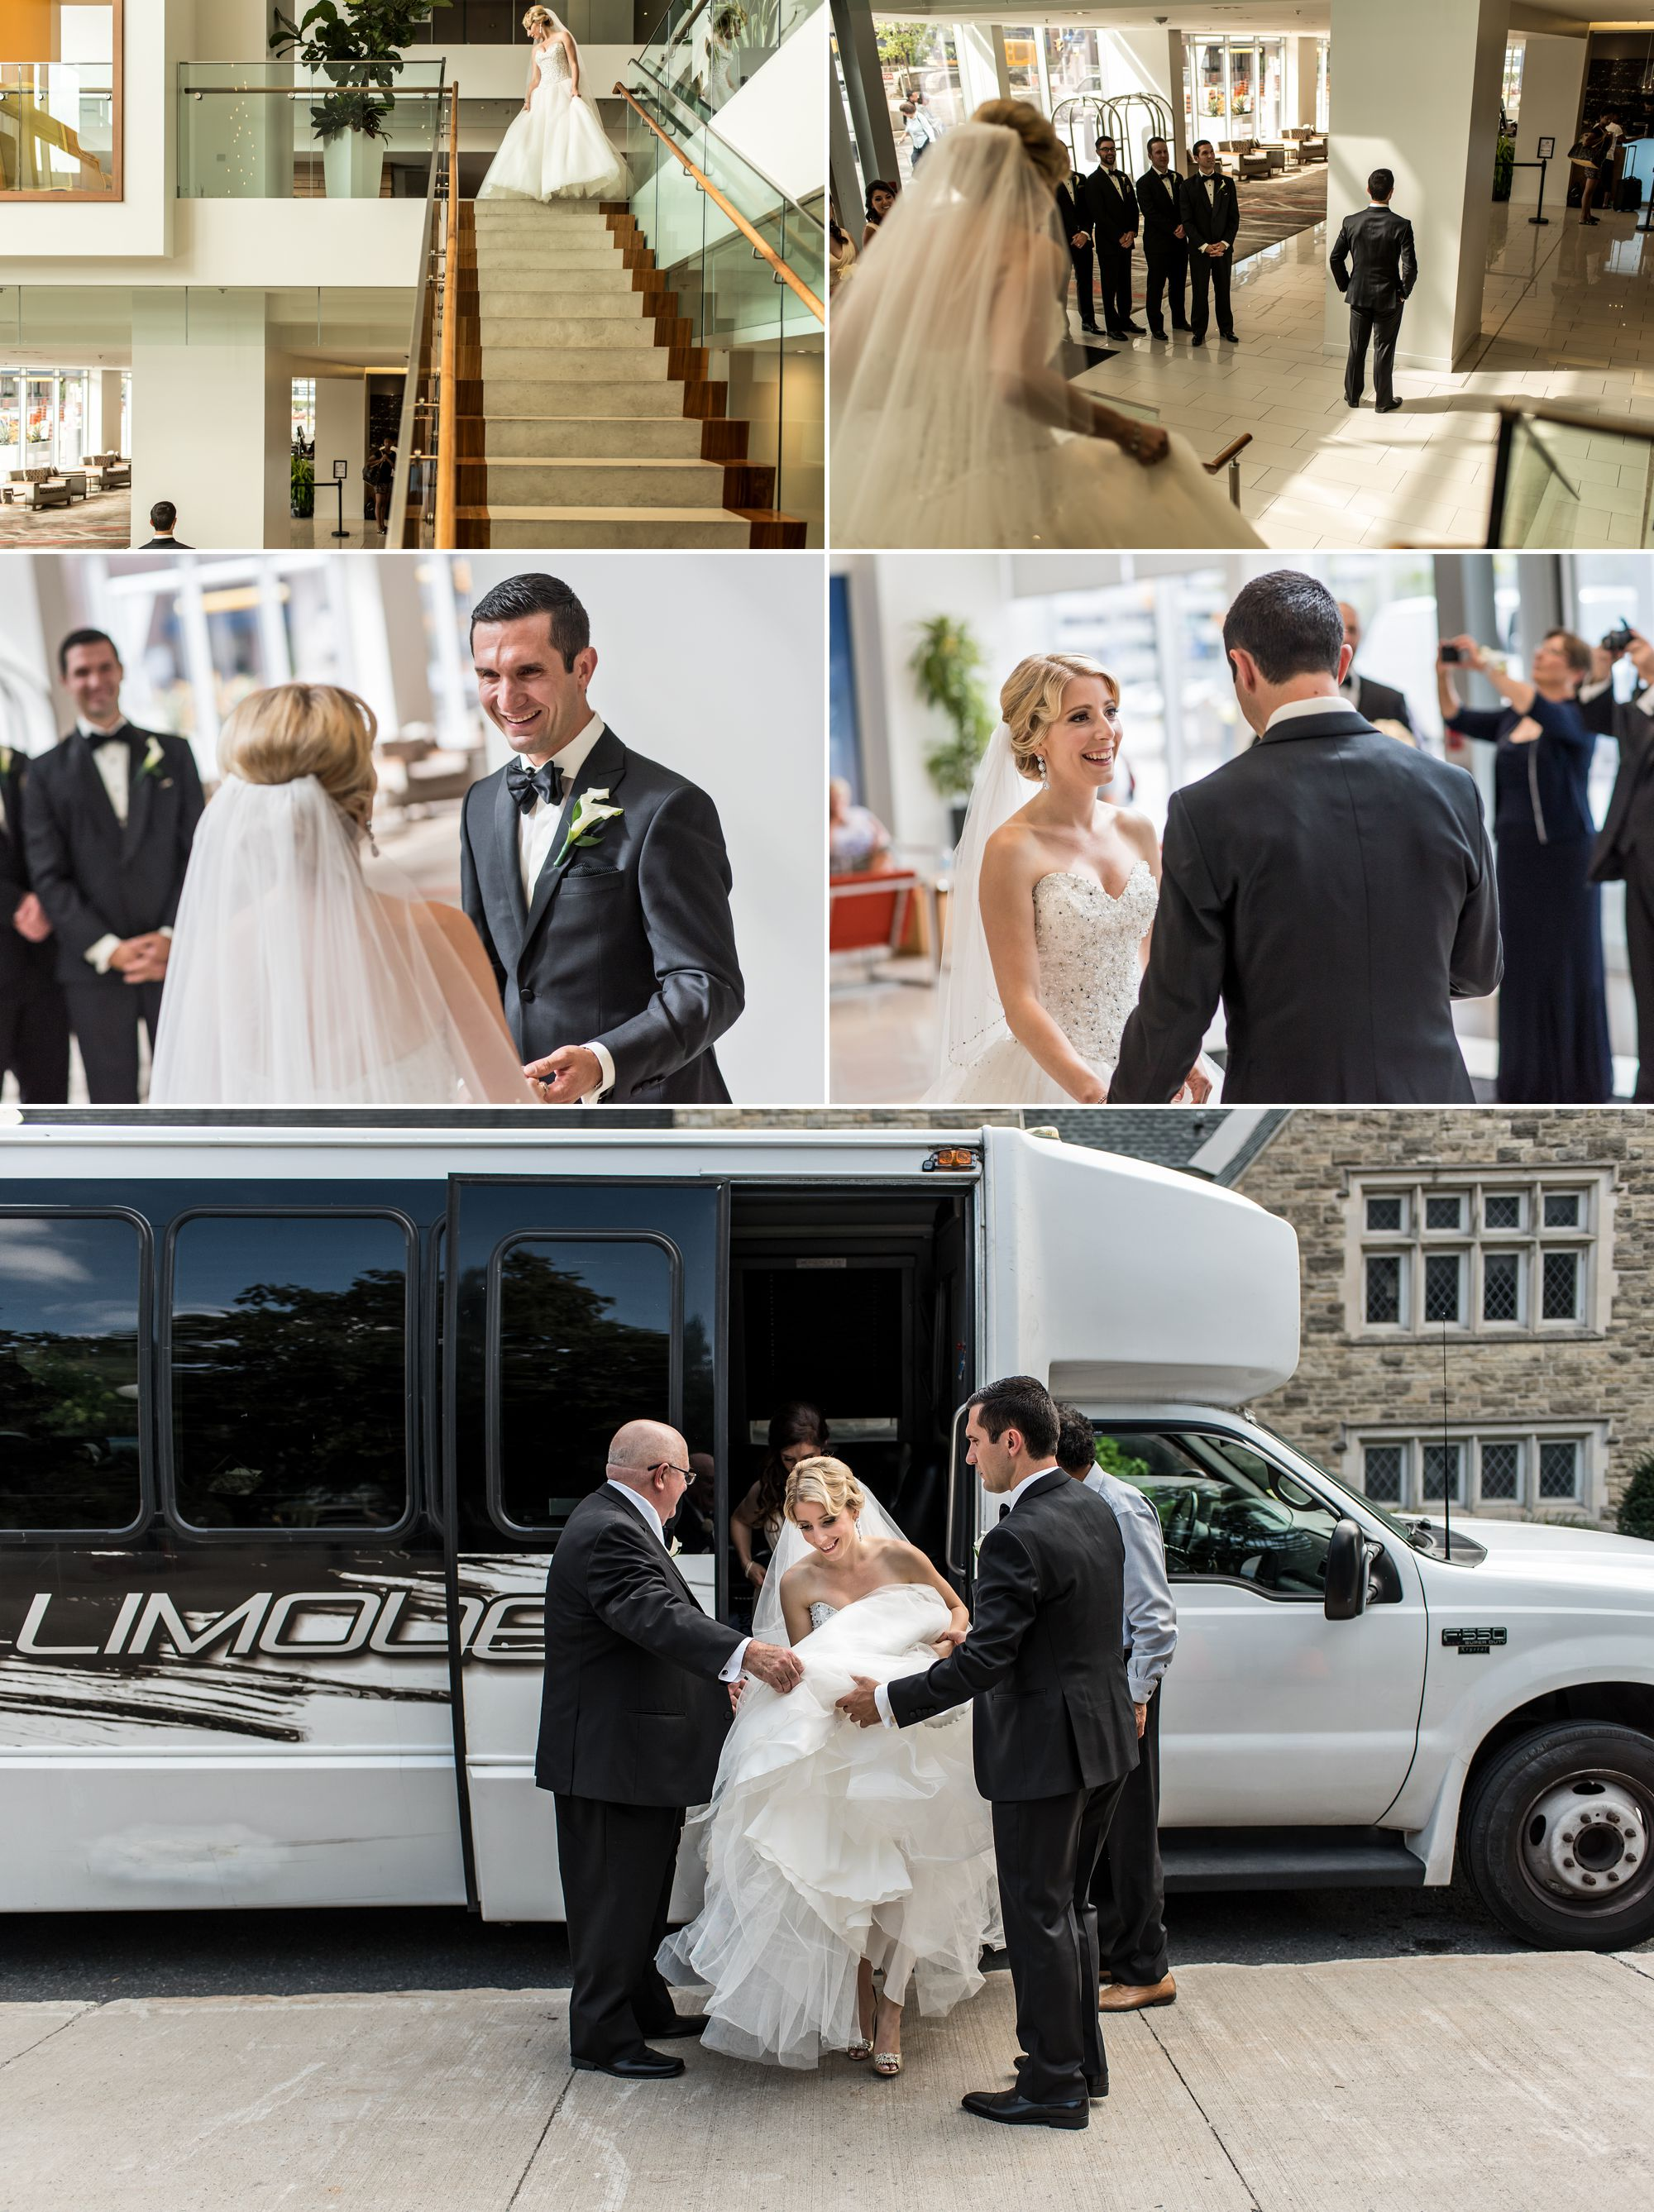 Wedding first look photographs